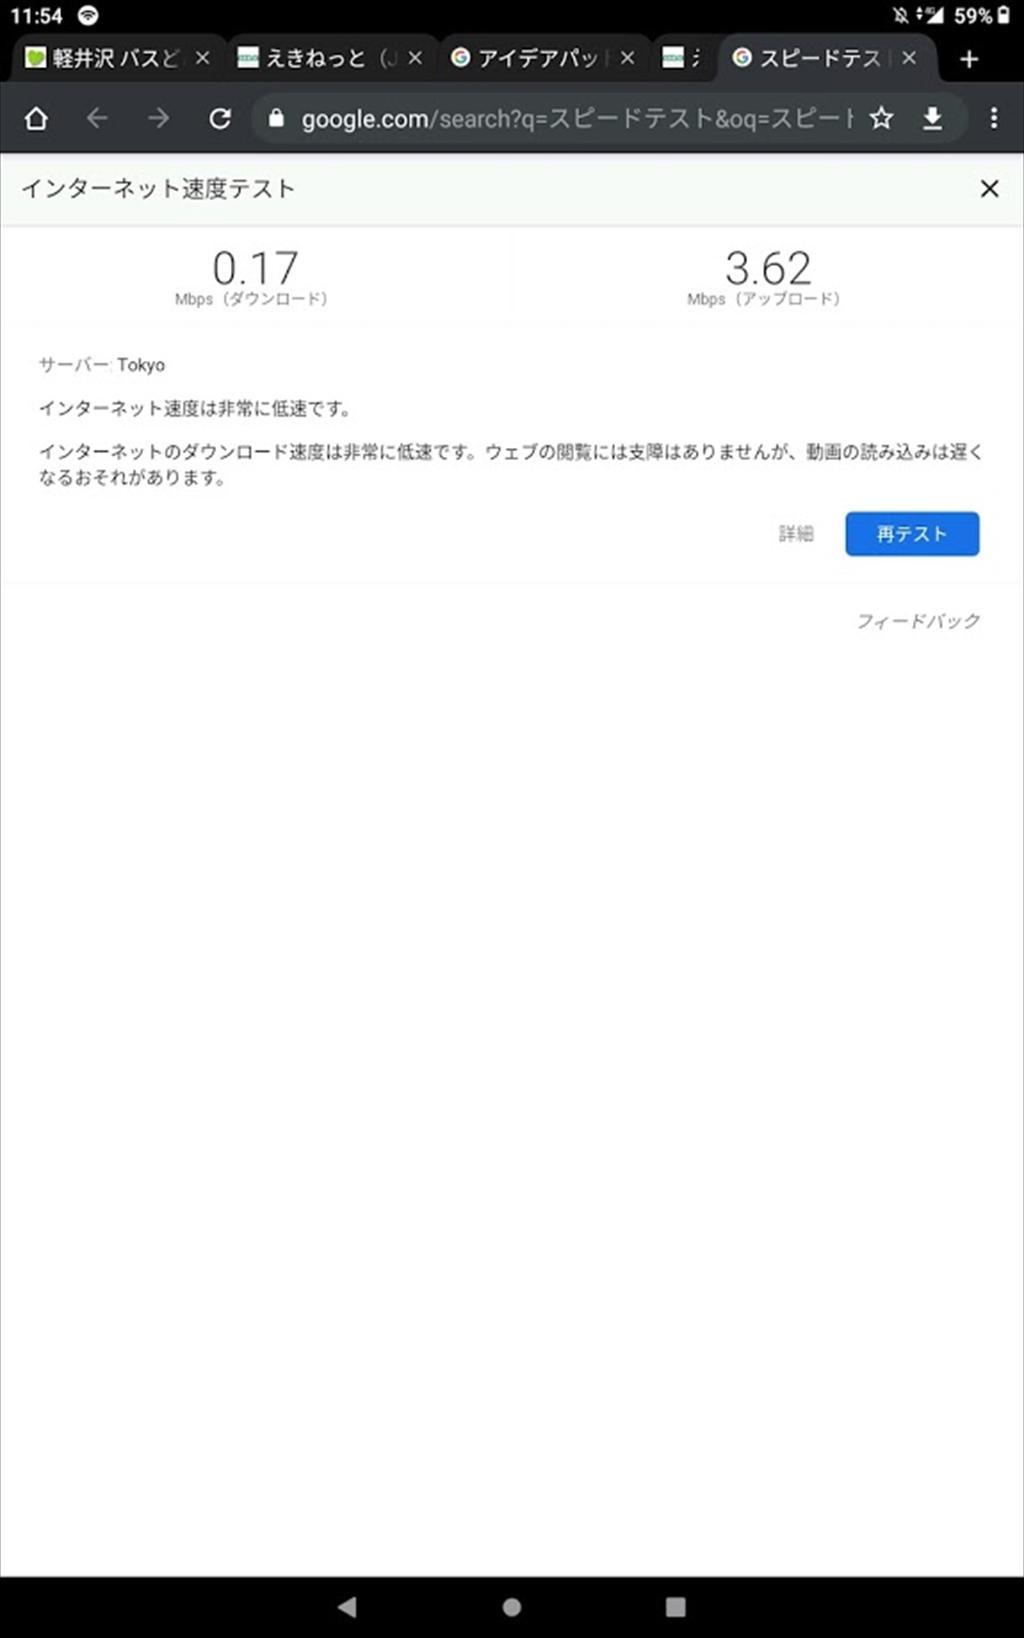 https://hayashida.jp/o/images2019-/Screenshot_2021-01-04-11-54-42-320_R.JPG